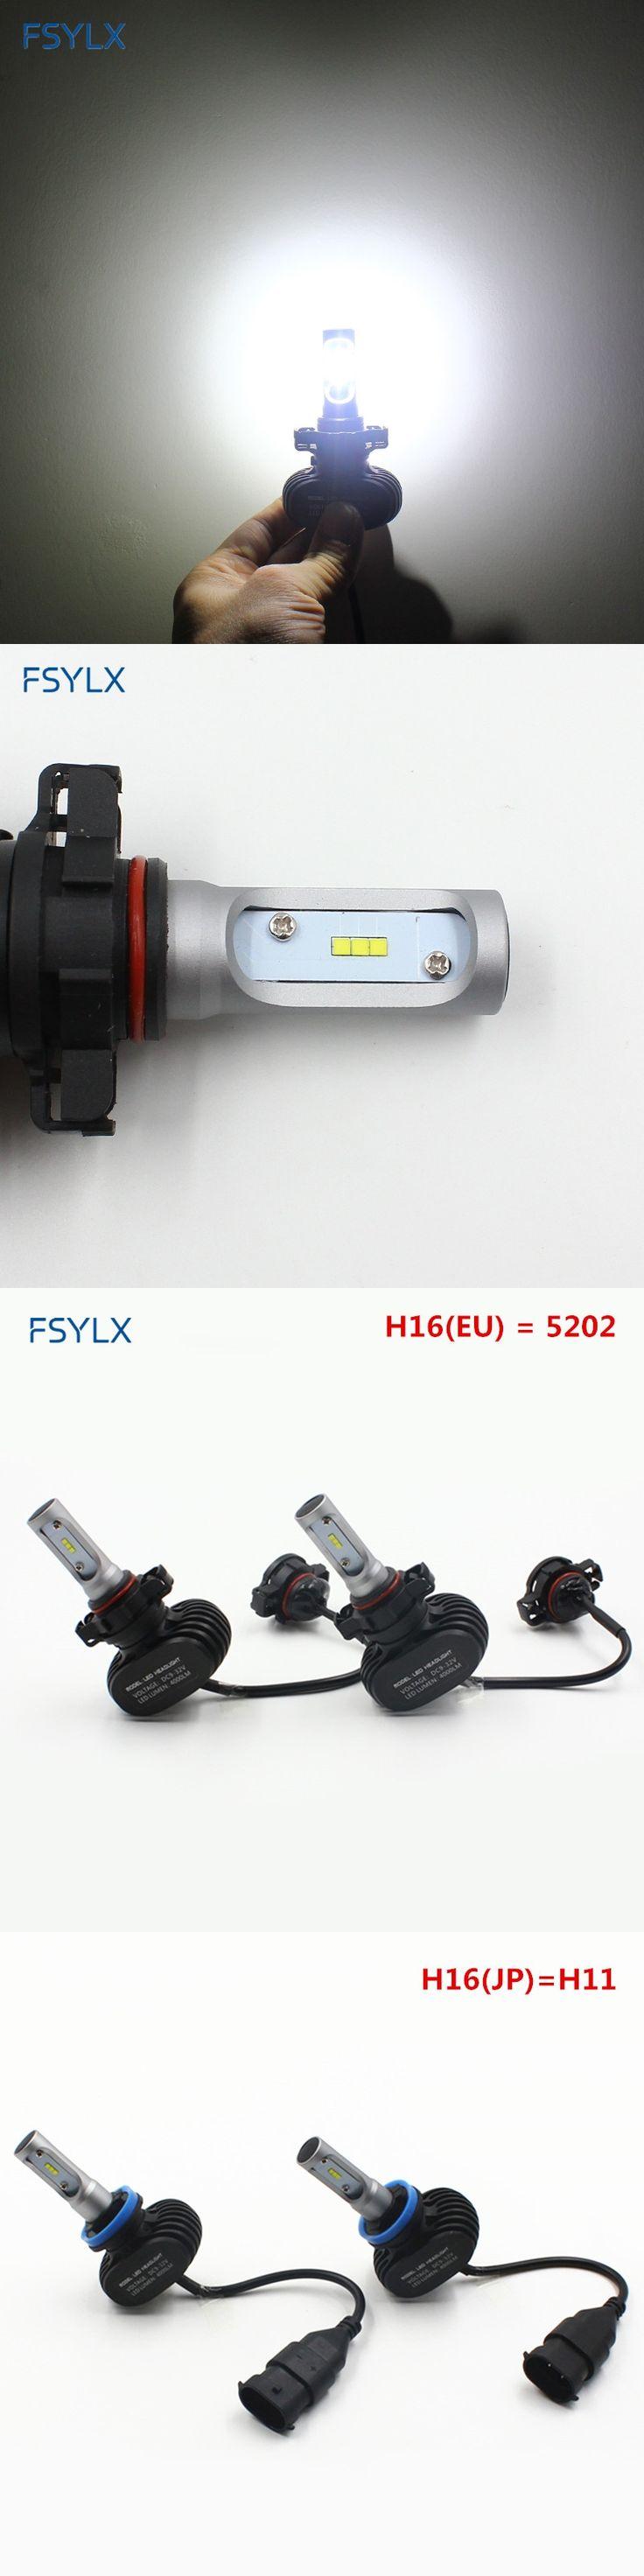 FSYLX H16 (EU) 5202 H16 (JP) H11 LED Car headlight Bulb headlamp LED DRL Fog lamps Daytime Running Lights H16 Car LED headlight